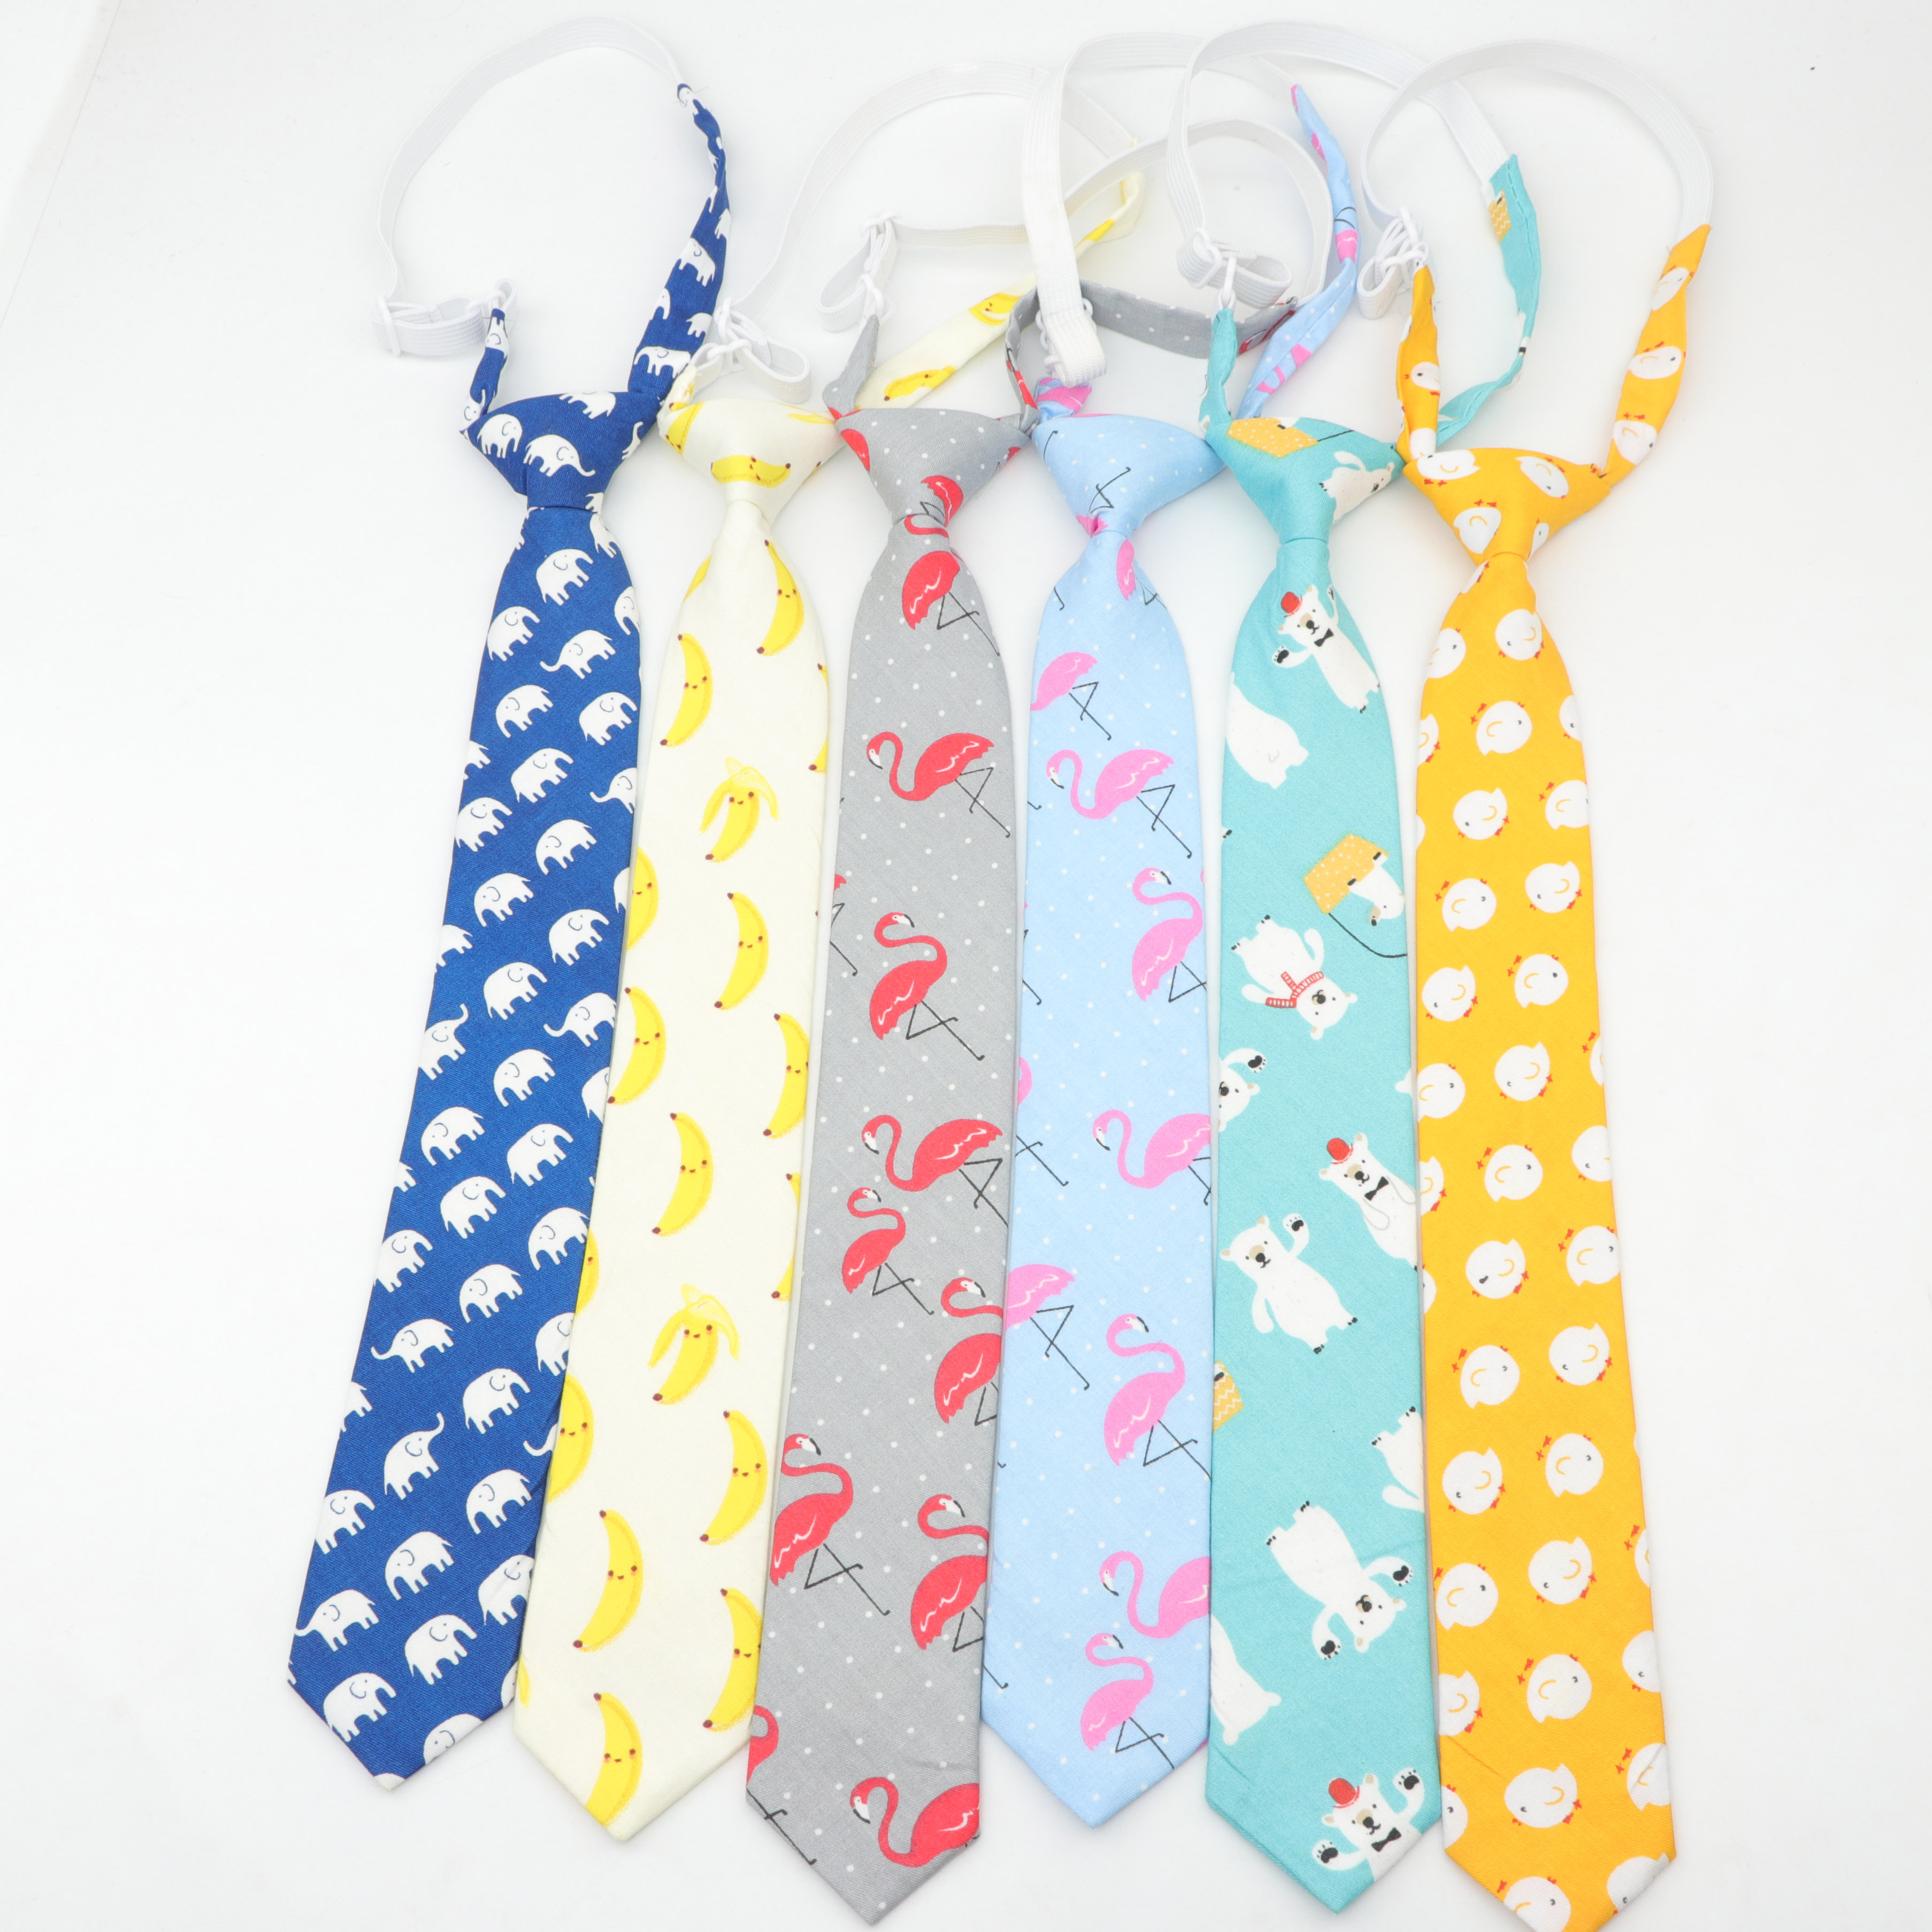 Cotton Kids Colorful Tie 5cm Width Duck Dog Fruit Floral Ties Boy Children Necktie Slim Skinny Cravate Narrow Thick Neckties